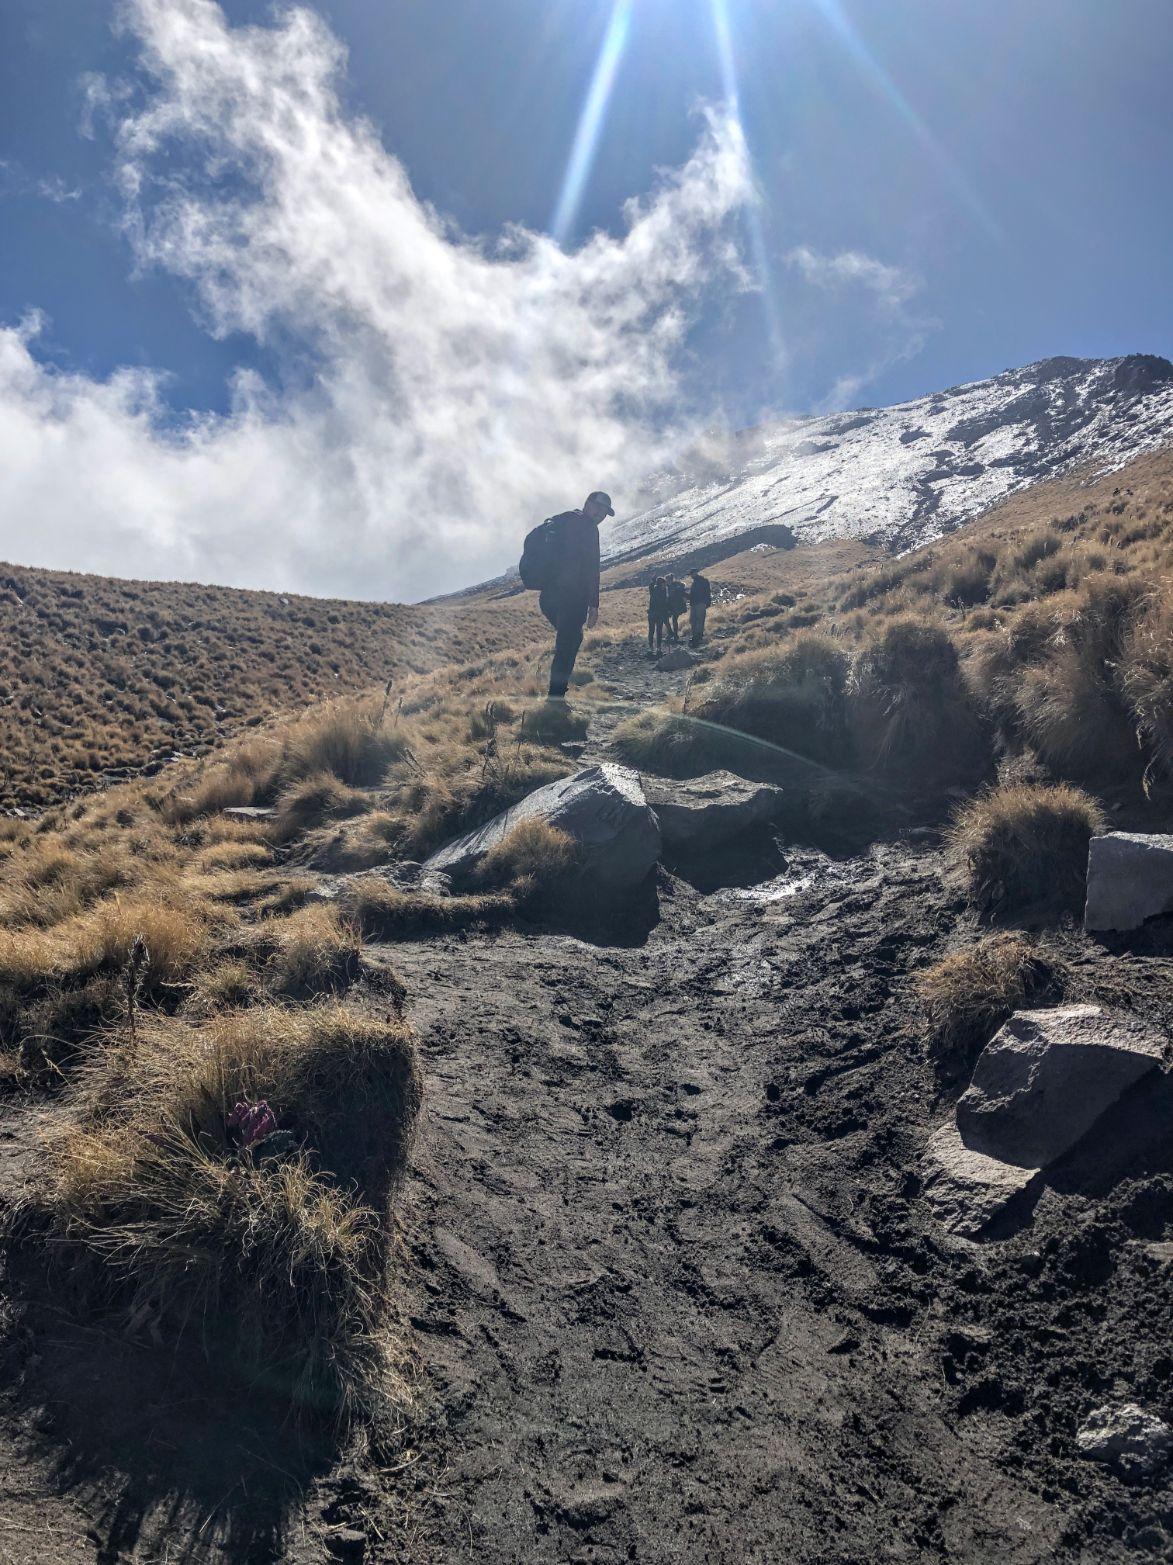 beginning the super steep uphill climb up Malinche